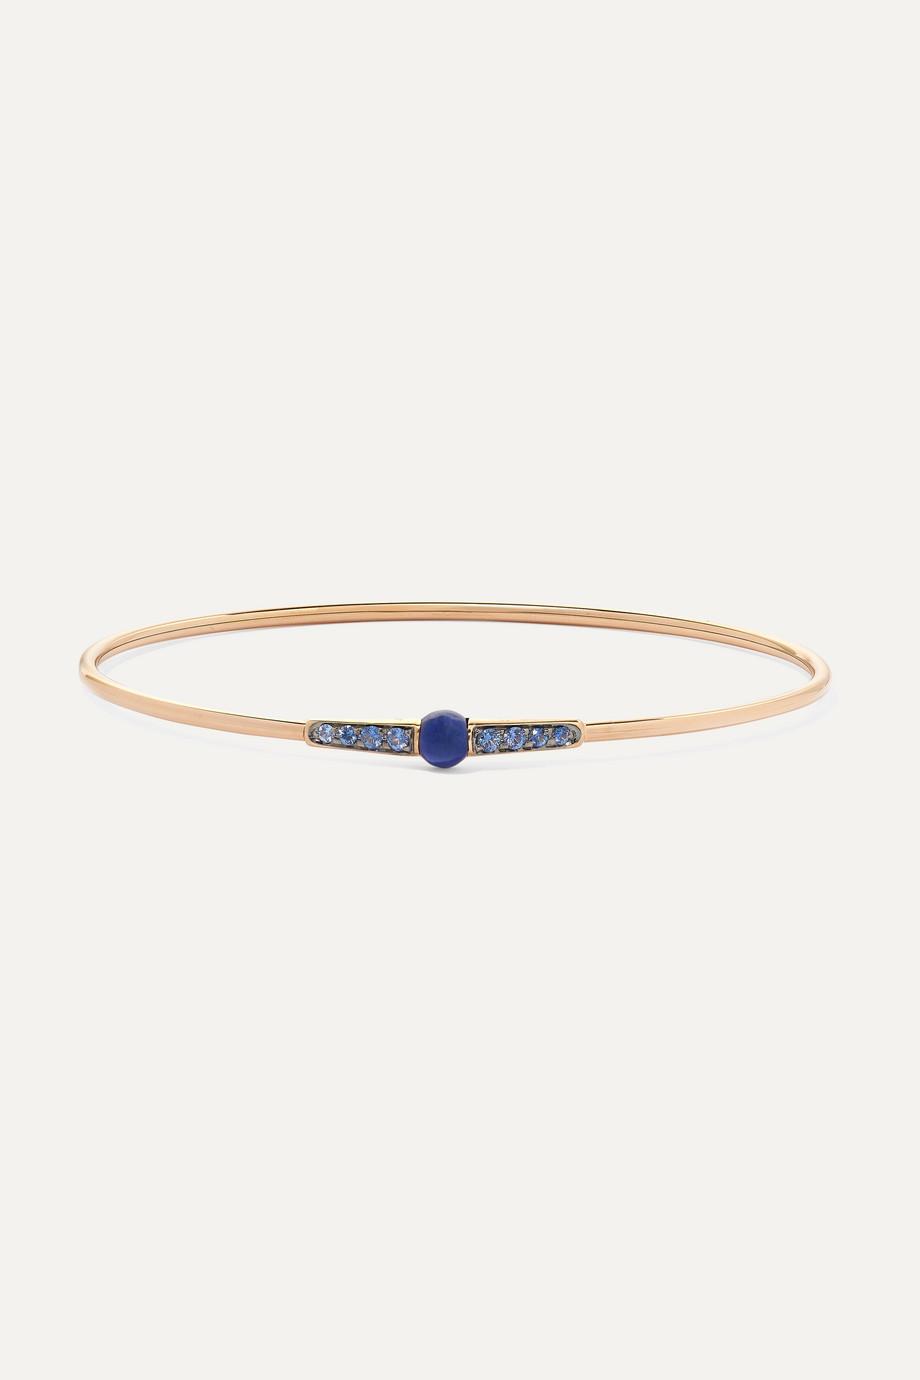 Pomellato M'ama non M'ama 18-karat rose gold, lapis lazuli and sapphire bracelet